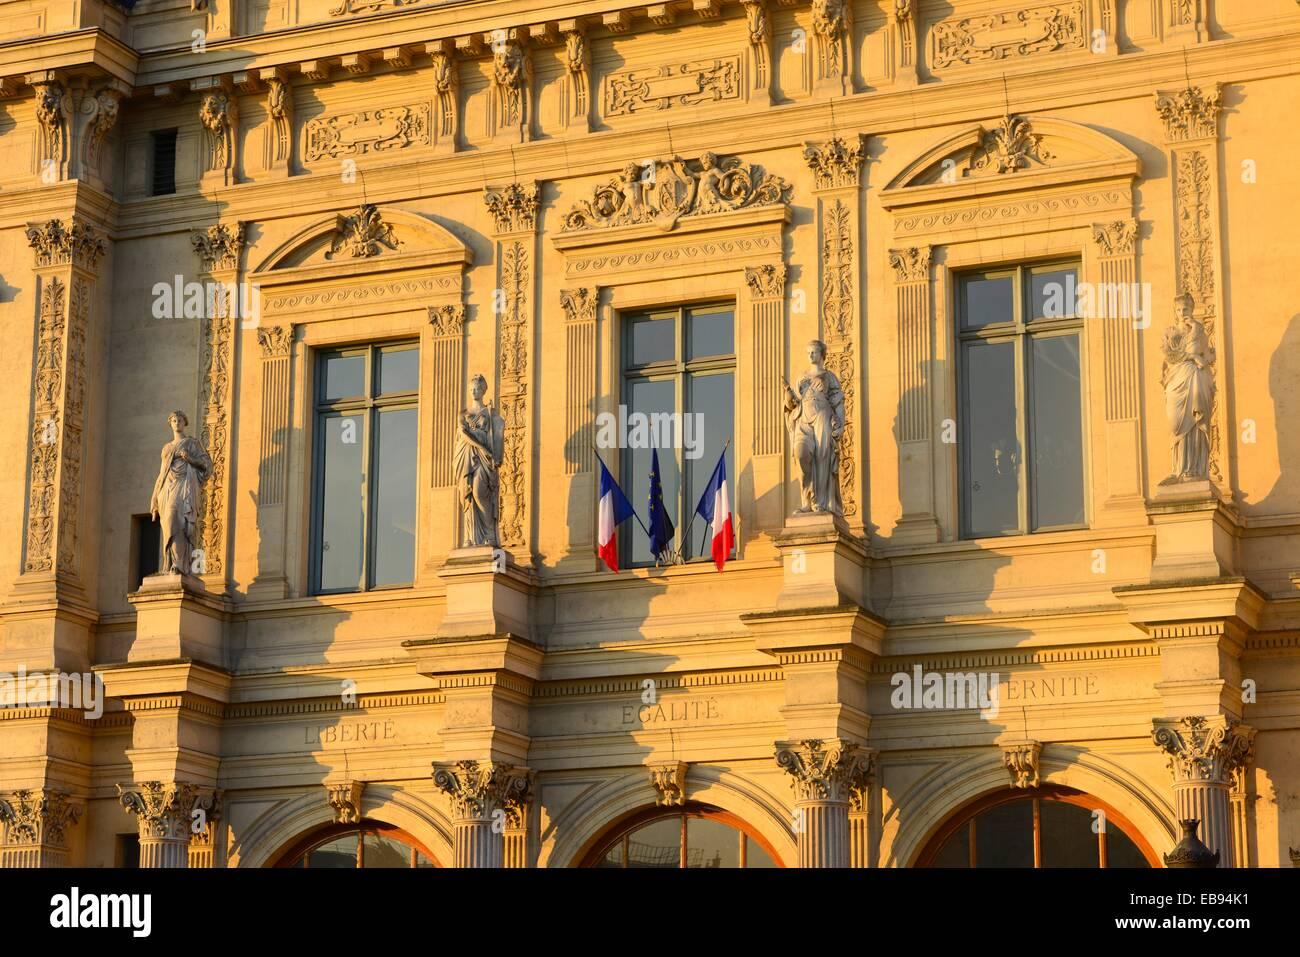 Paris commercial court ,France,Europe. - Stock Image